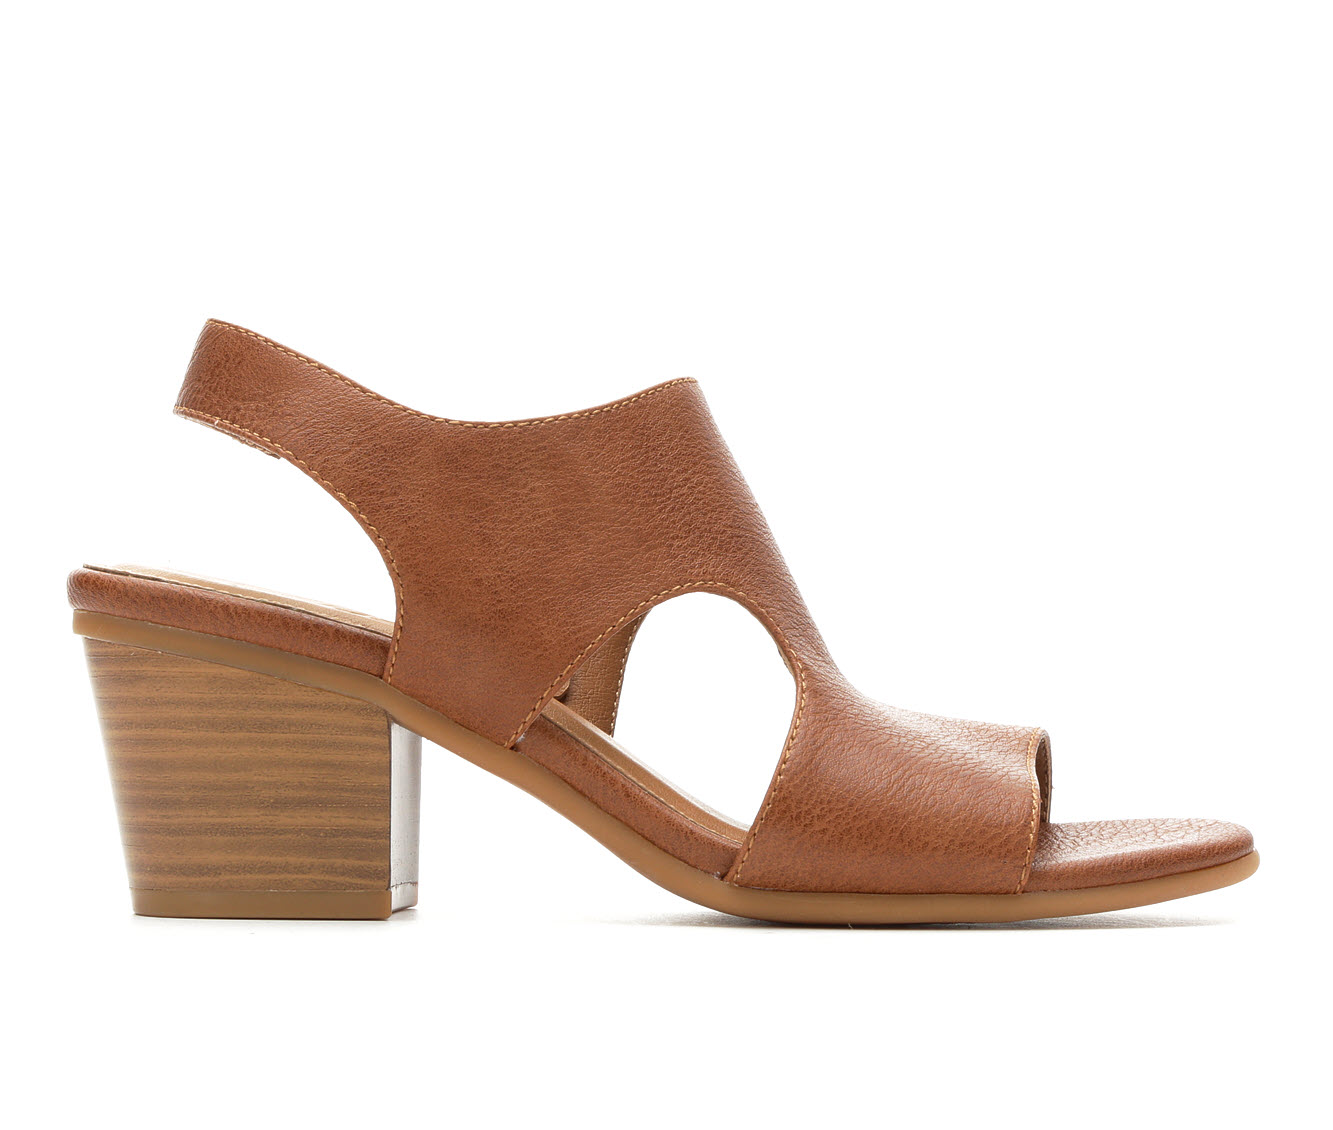 Vintage 7 Eight Morgan Women's Dress Shoe (Brown Faux Leather)